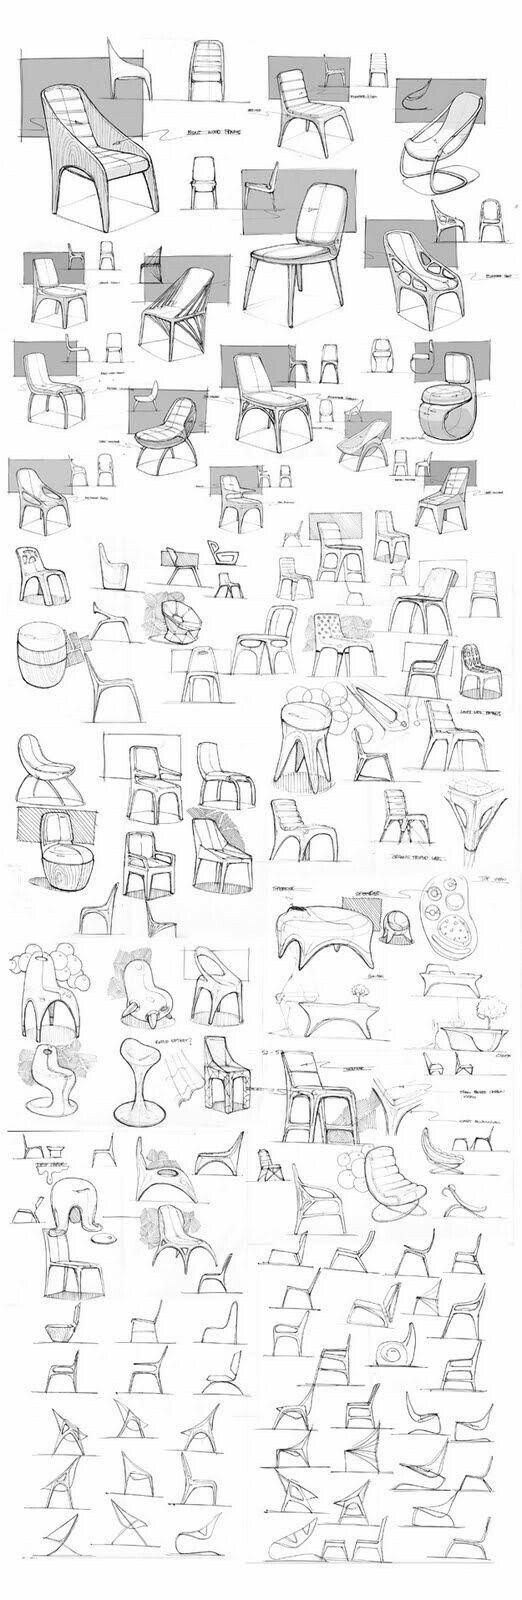 Industrial Art FurnitureFurniture SketchesFurniture DesignIndustrial